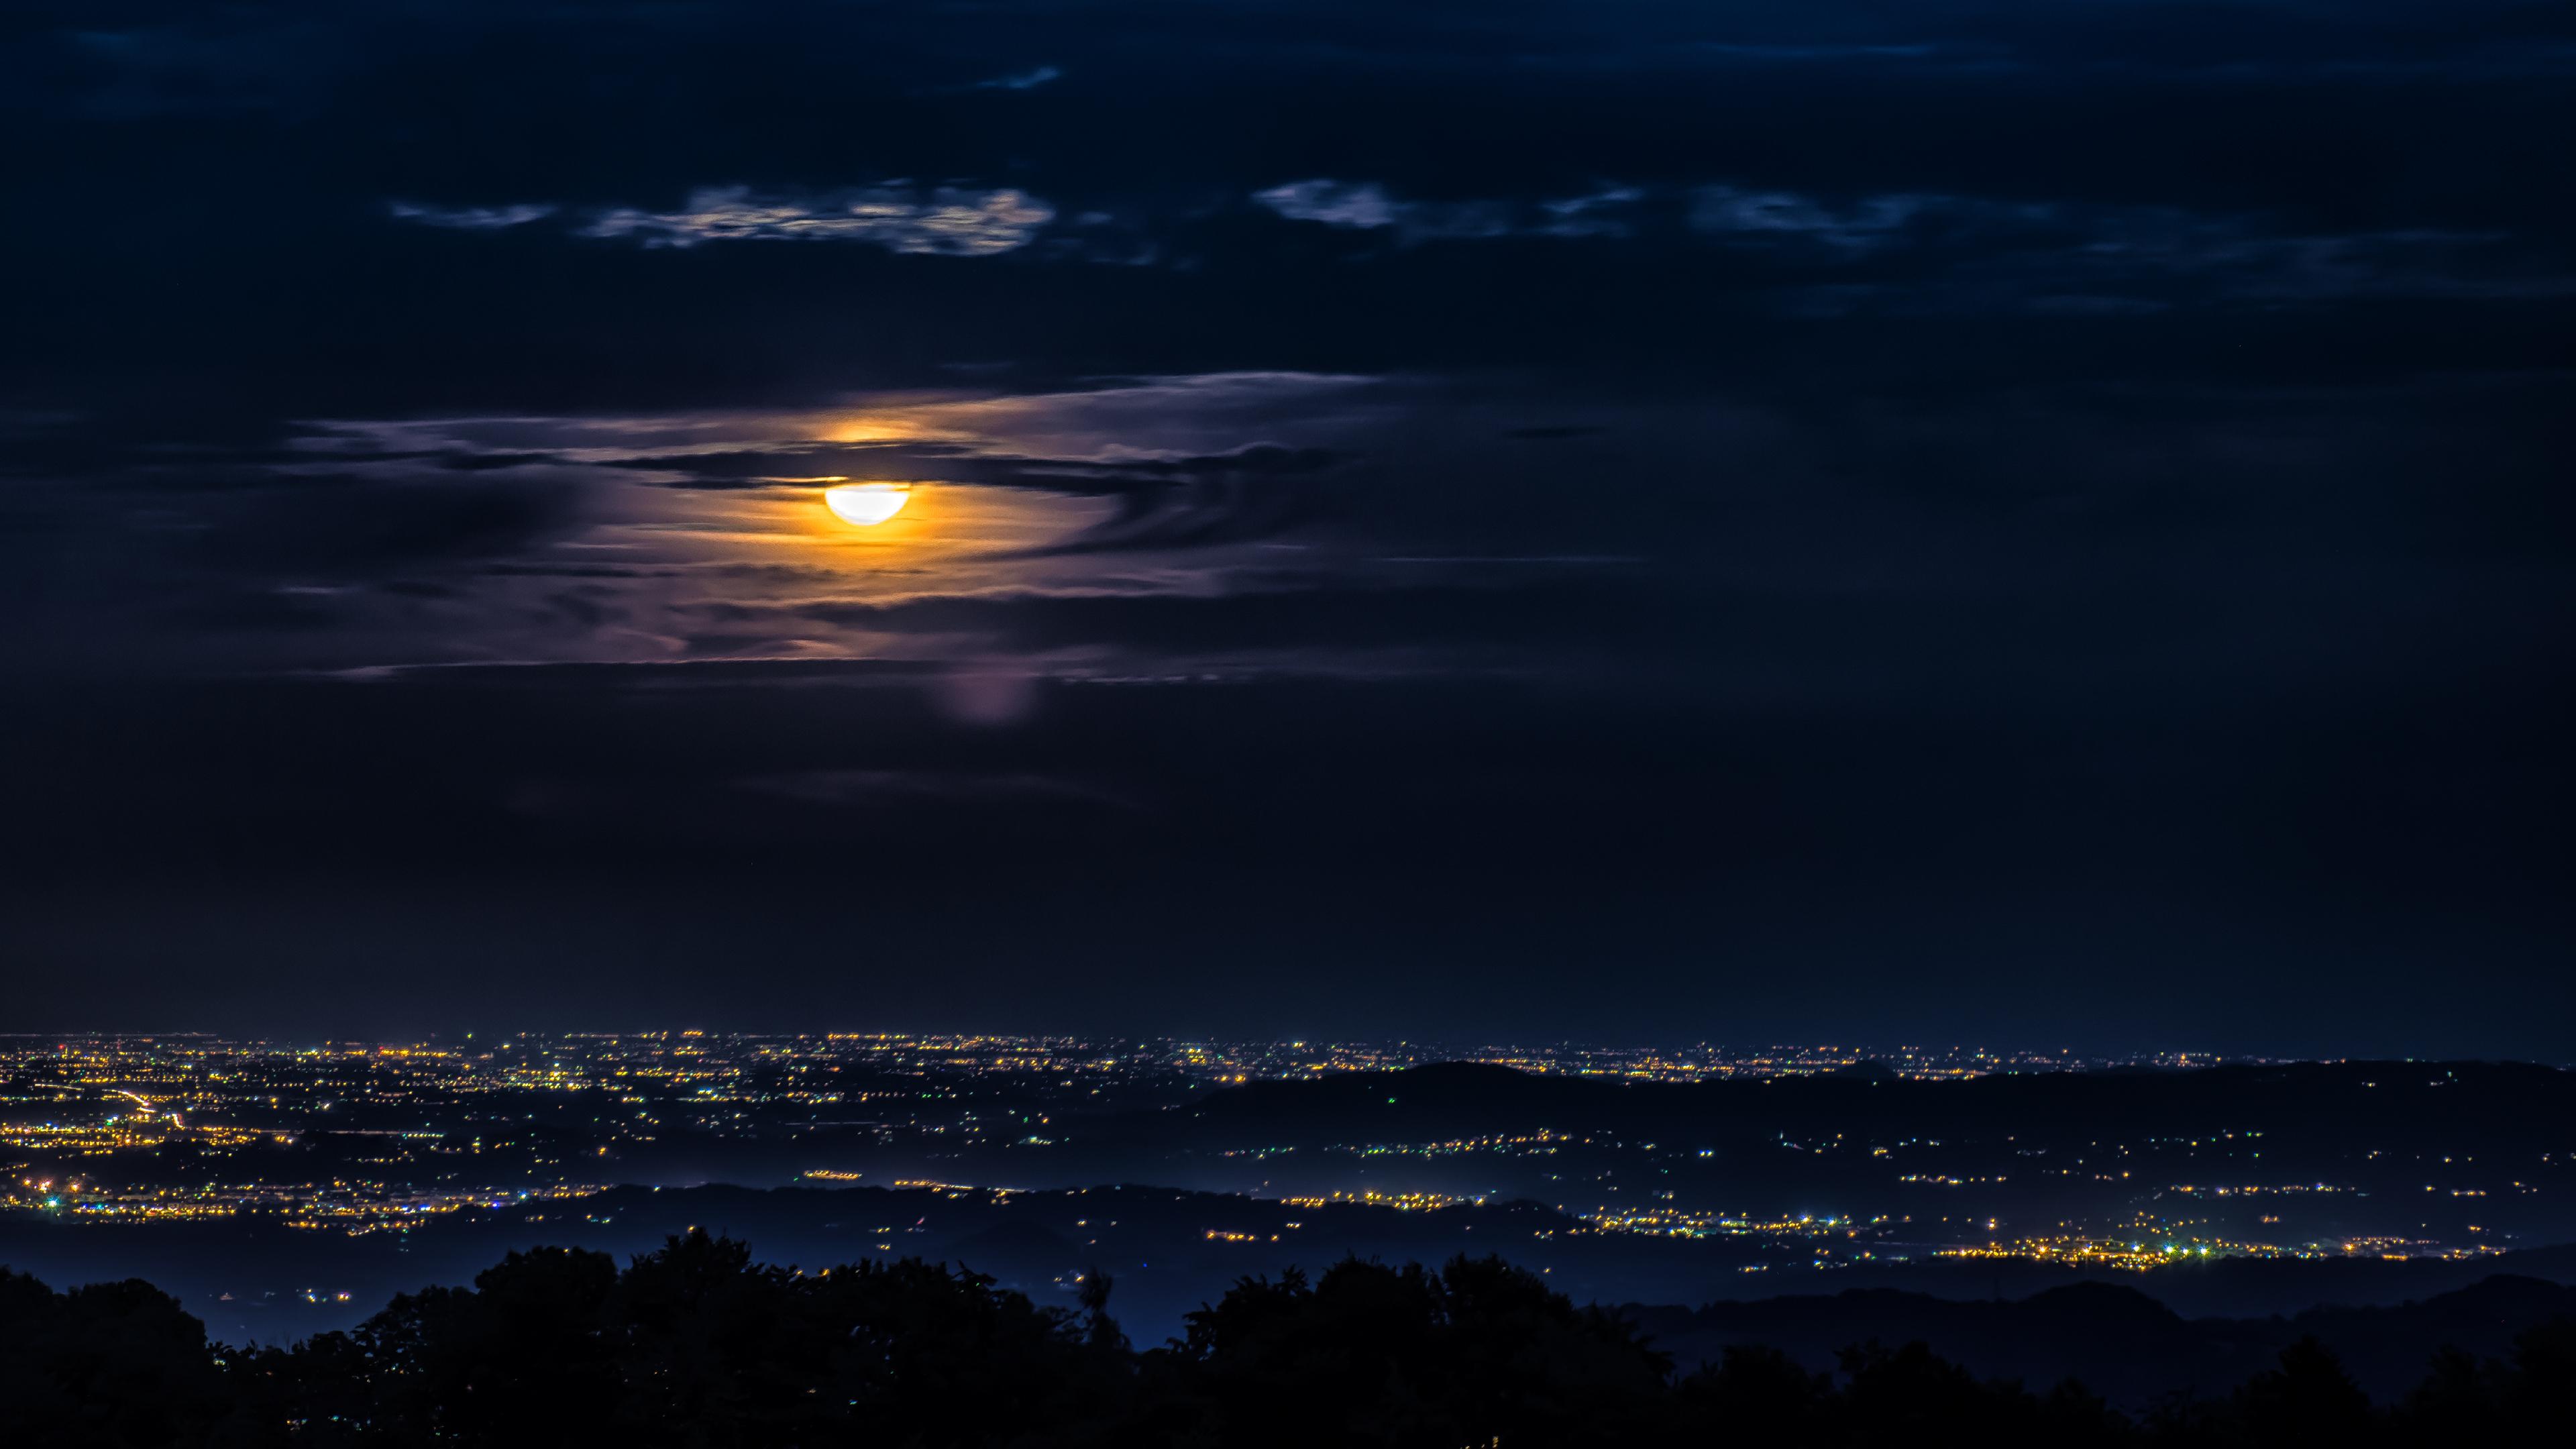 4k Moon Clouds Night City View Wallpaper Hd Nature 4k